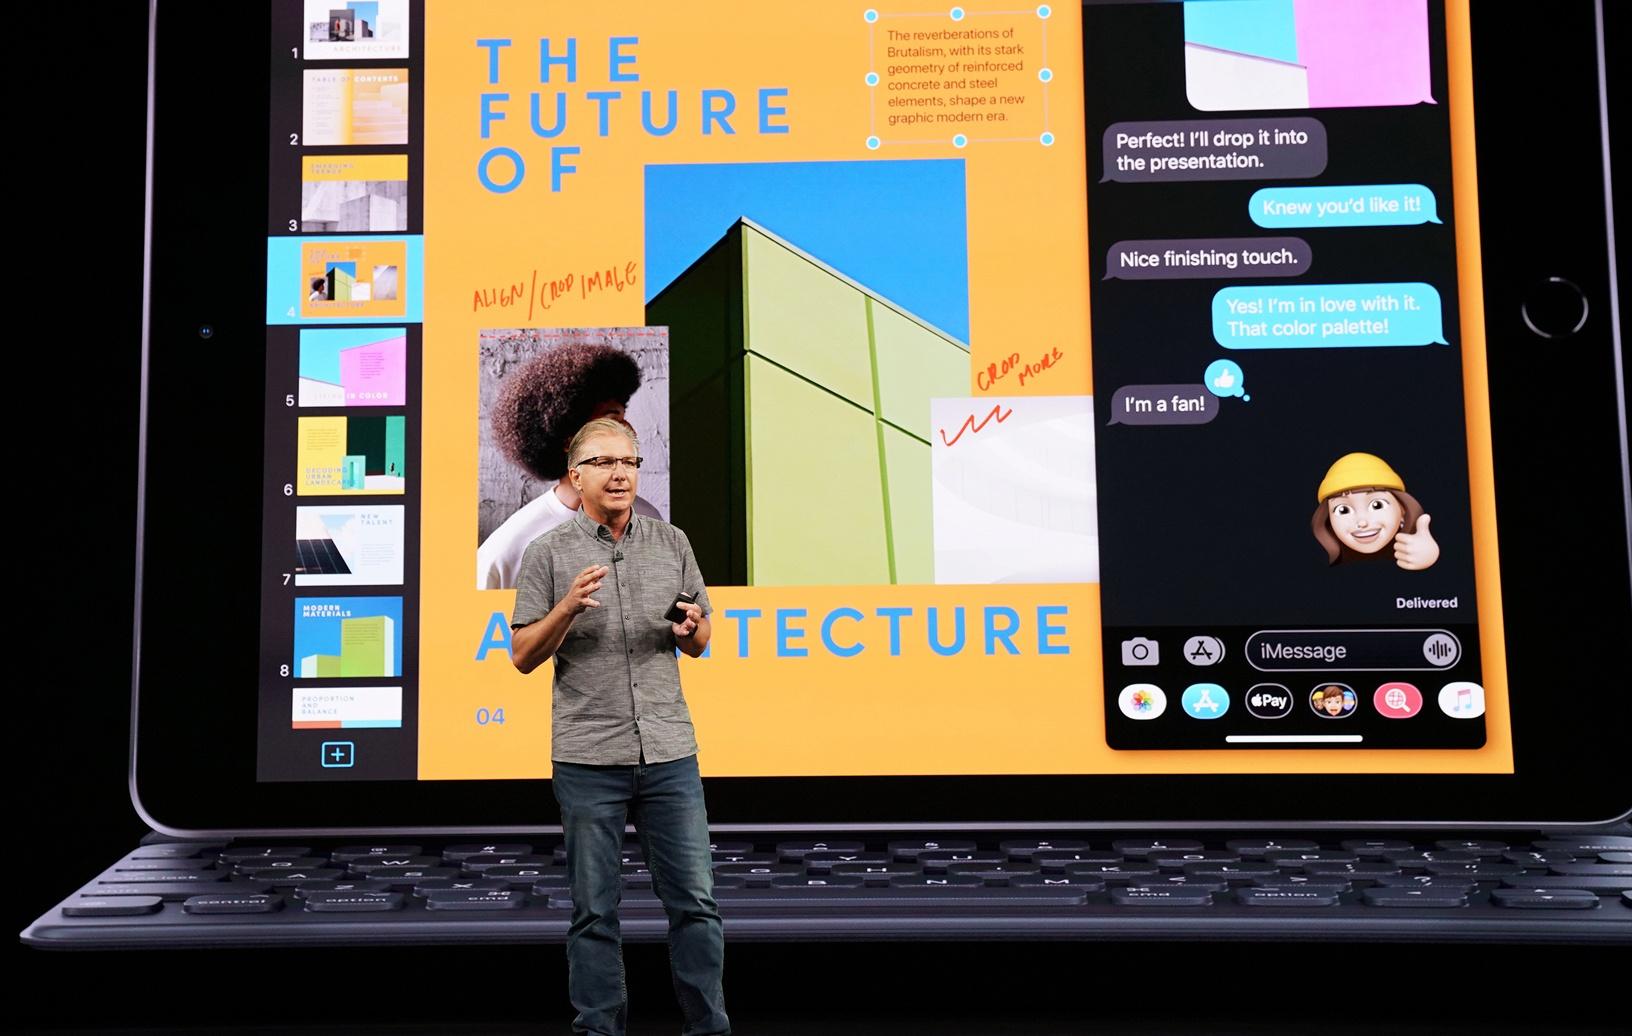 apple_keynote_event_greg-joswiak-unveils-seventh-generation-ipad_091019